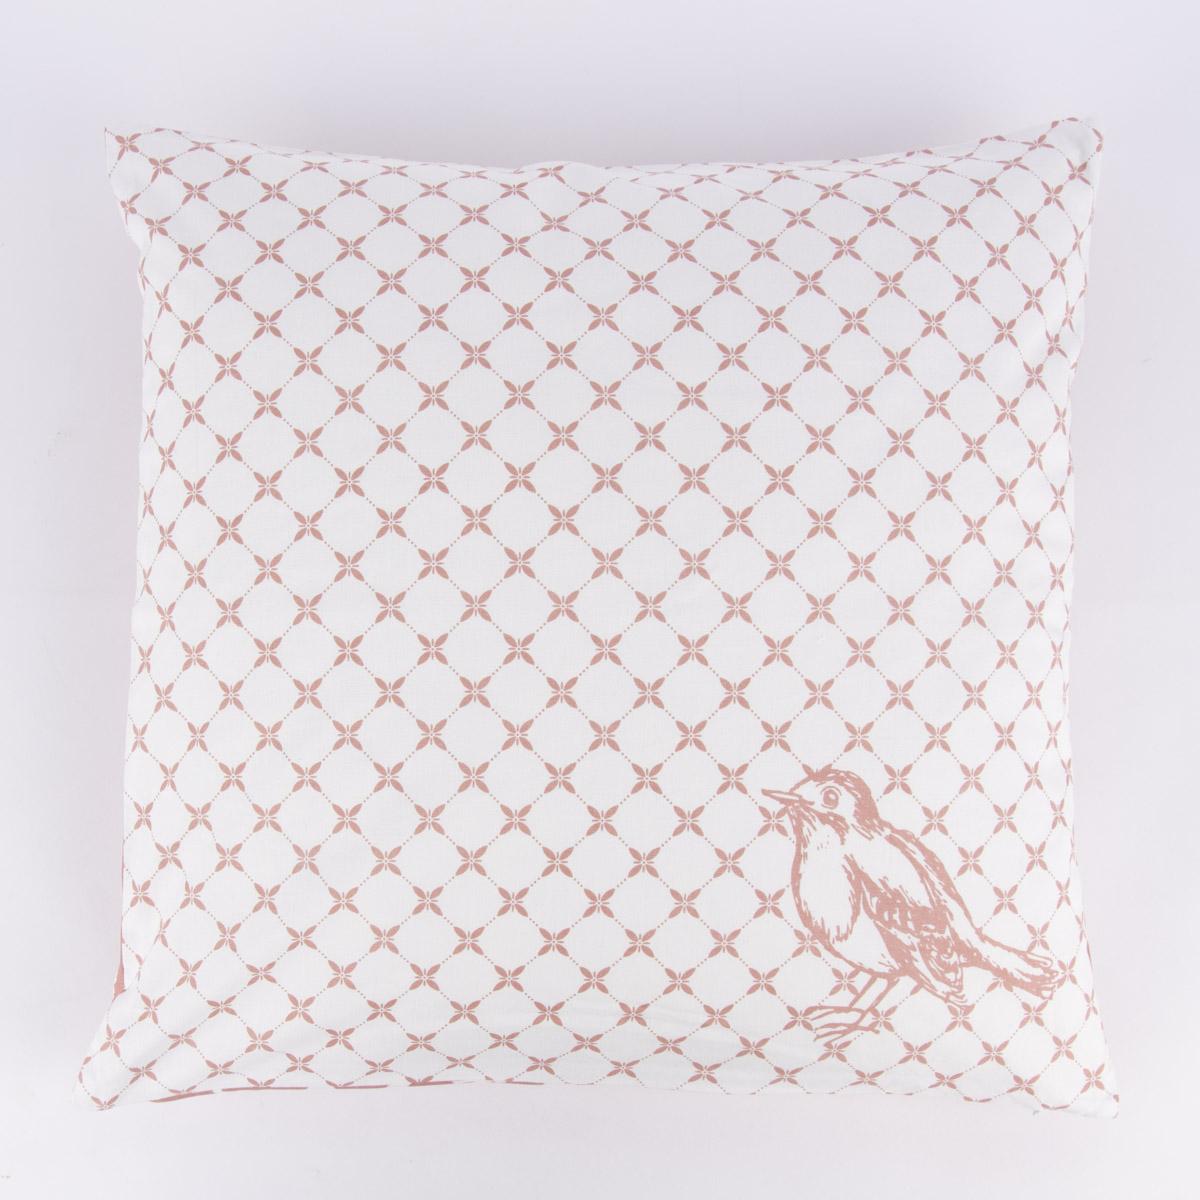 Clayre & Eef Wende-Kissenhülle Vögel Blumen rosa weiß 50x50cm